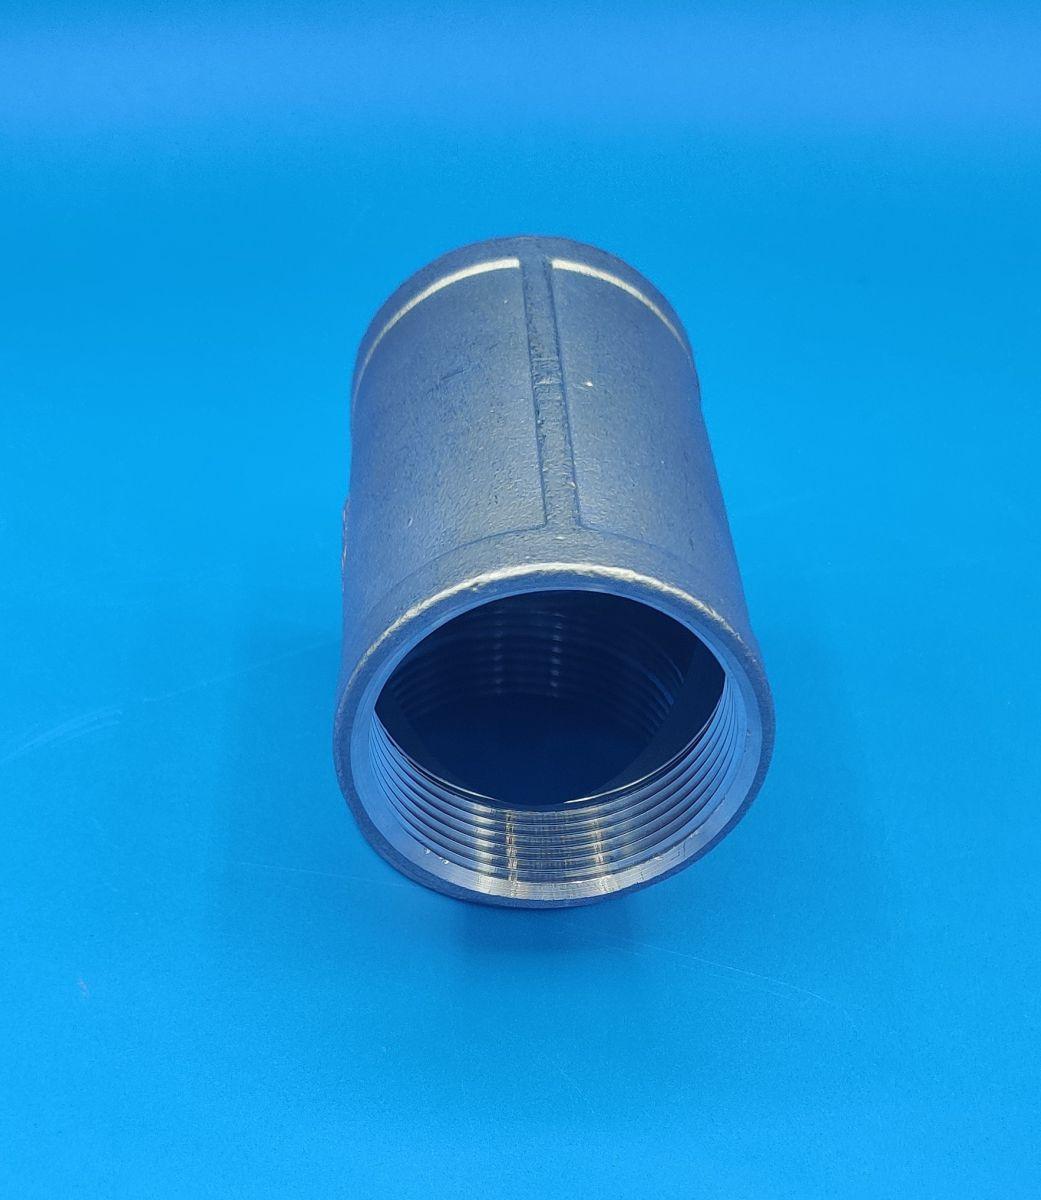 112 bspp equal tee stainless steel